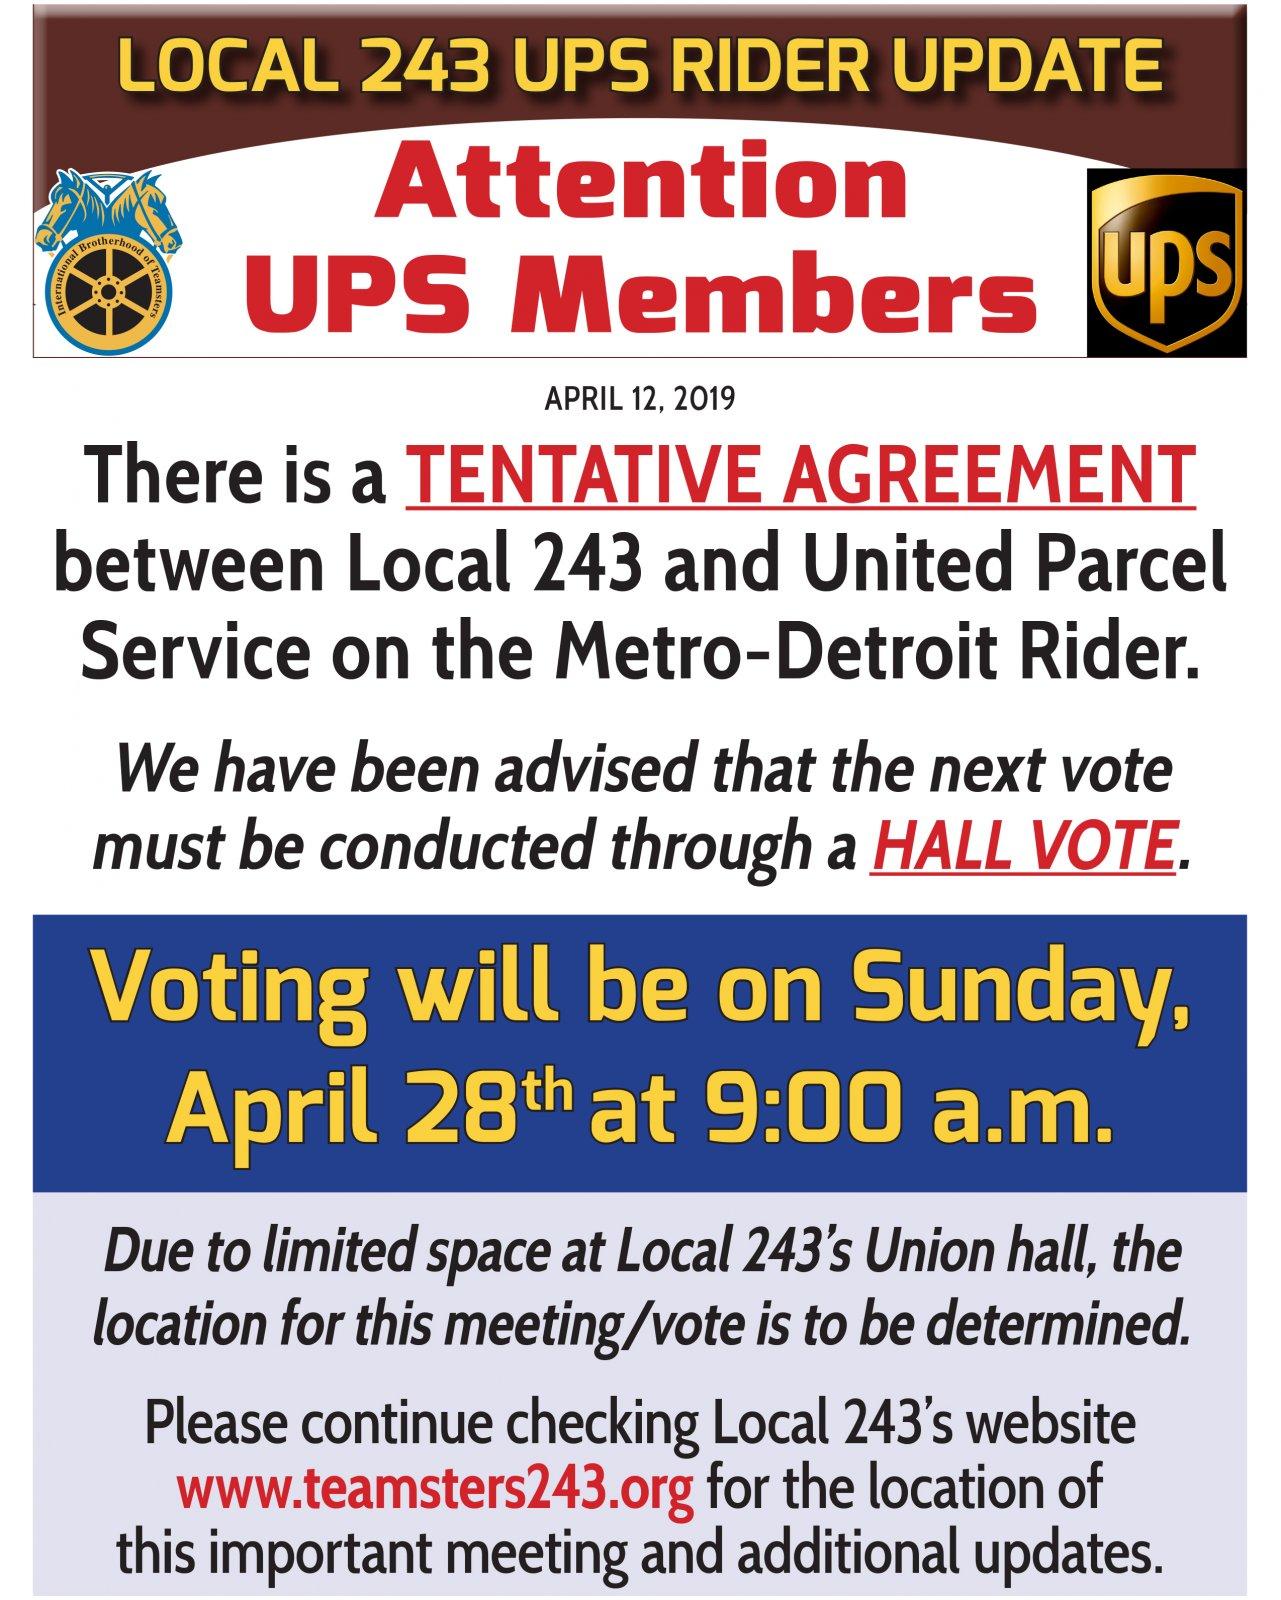 UPS RIDER UPDATE.jpg